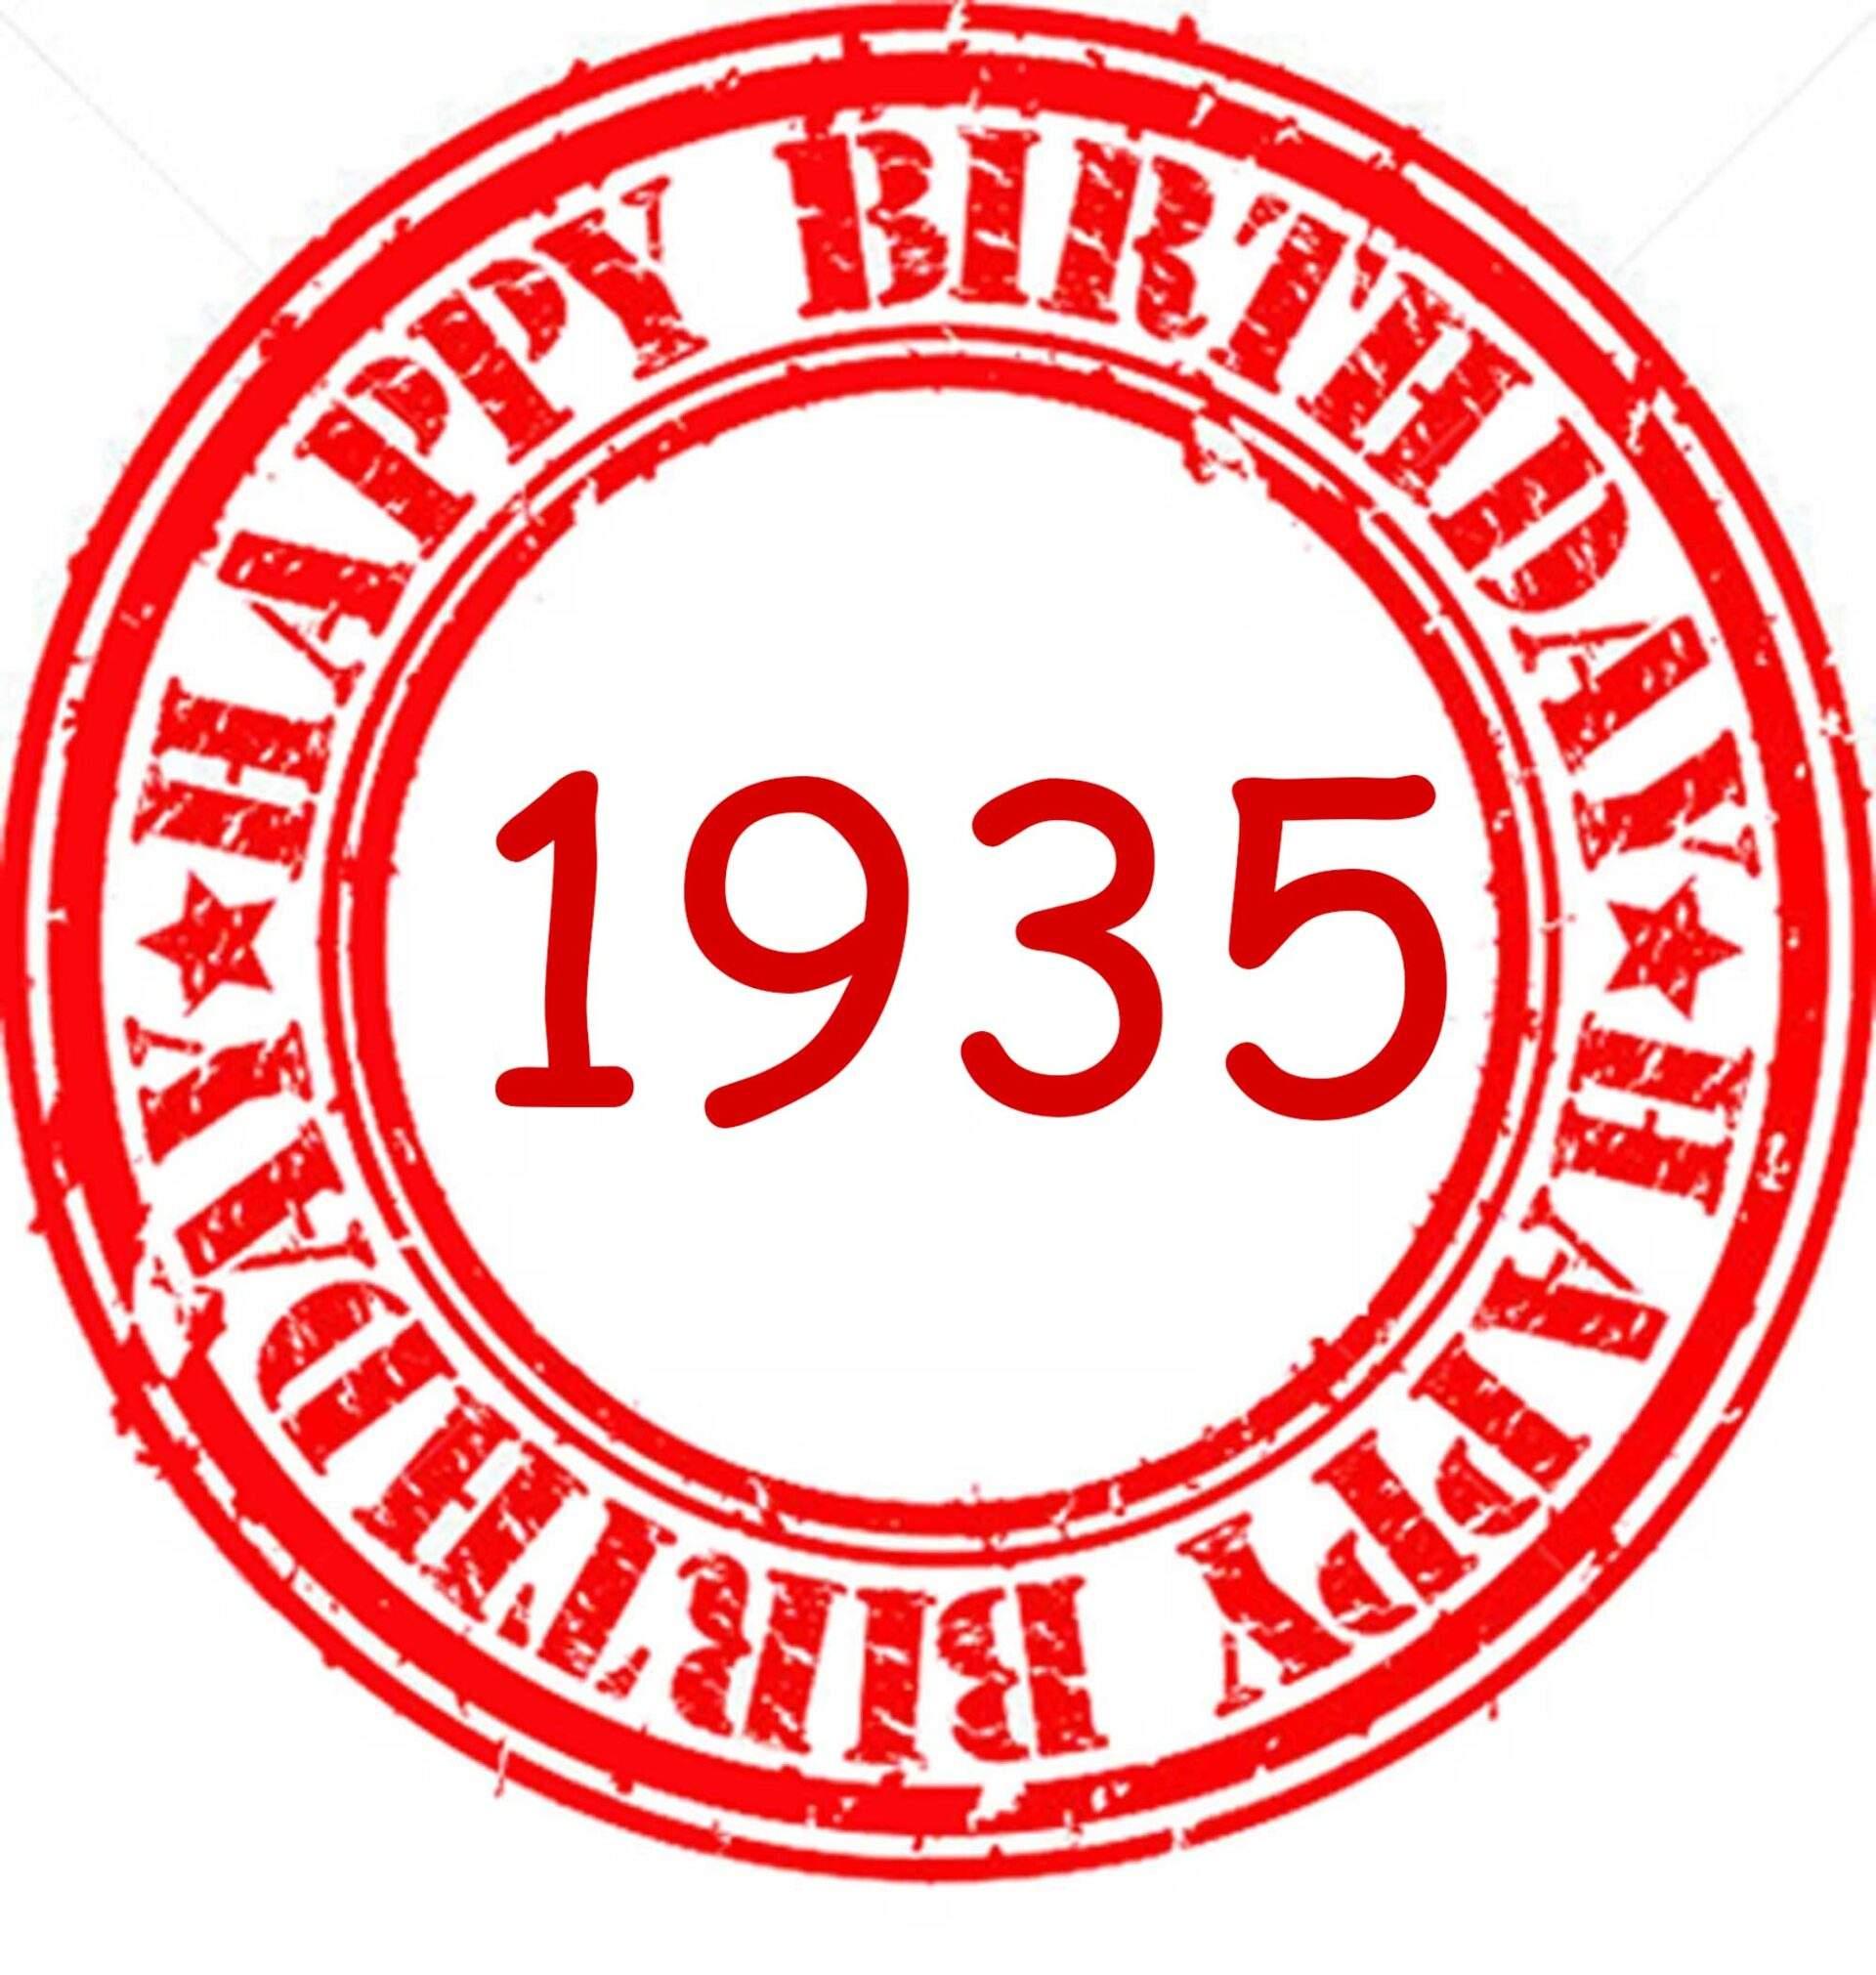 HAPPY BIRTHDAY 1935